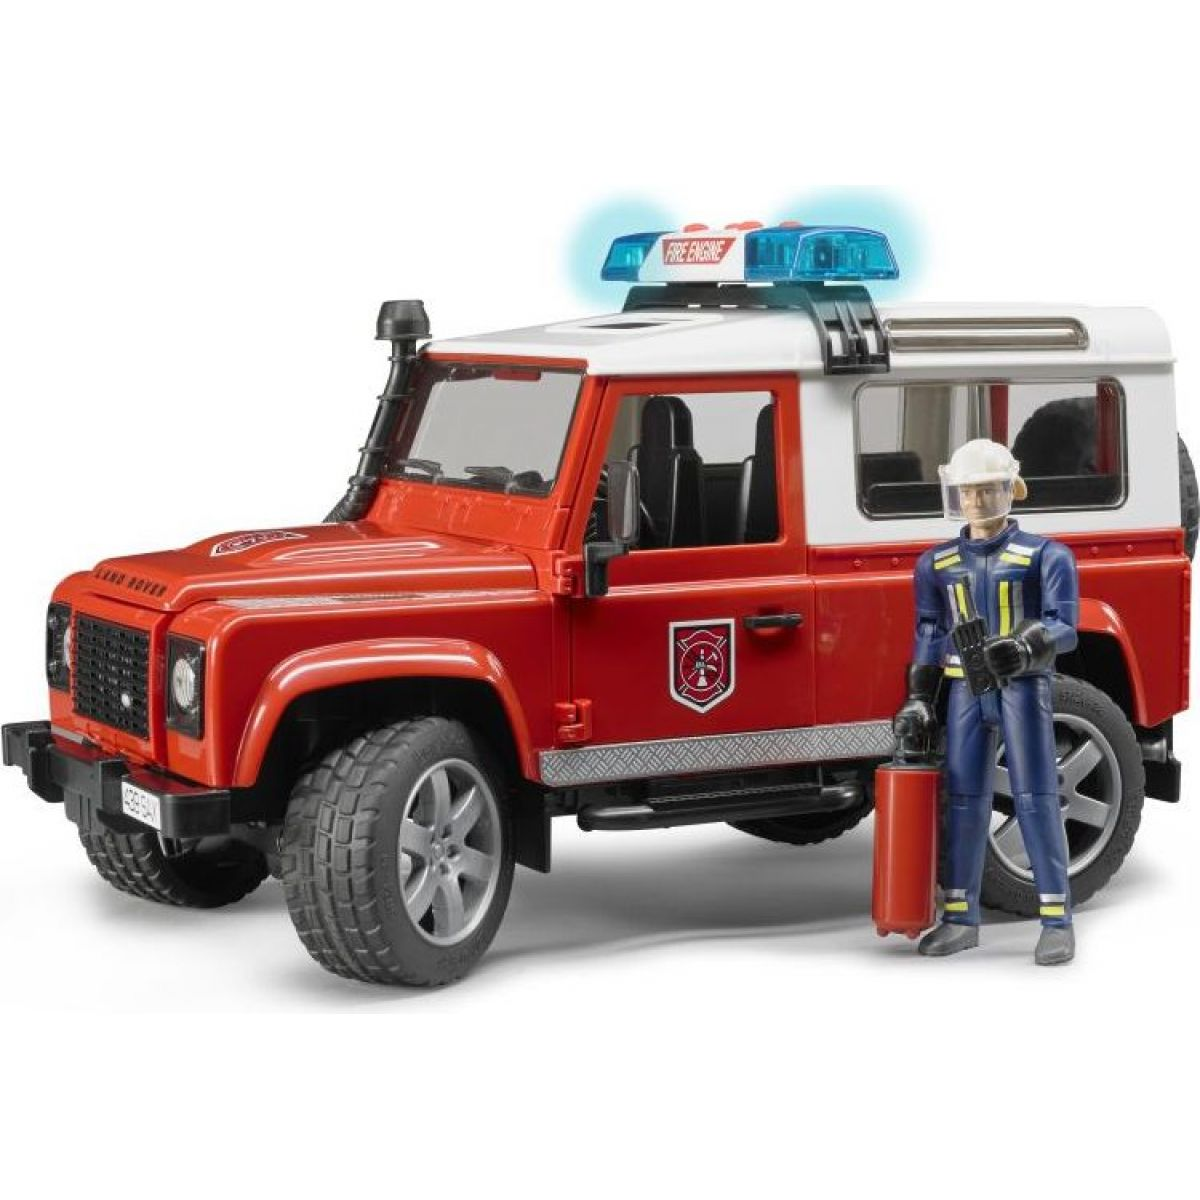 Bruder 2596 Land Rover Defender - Hasičské auto s figúrkou hasičov